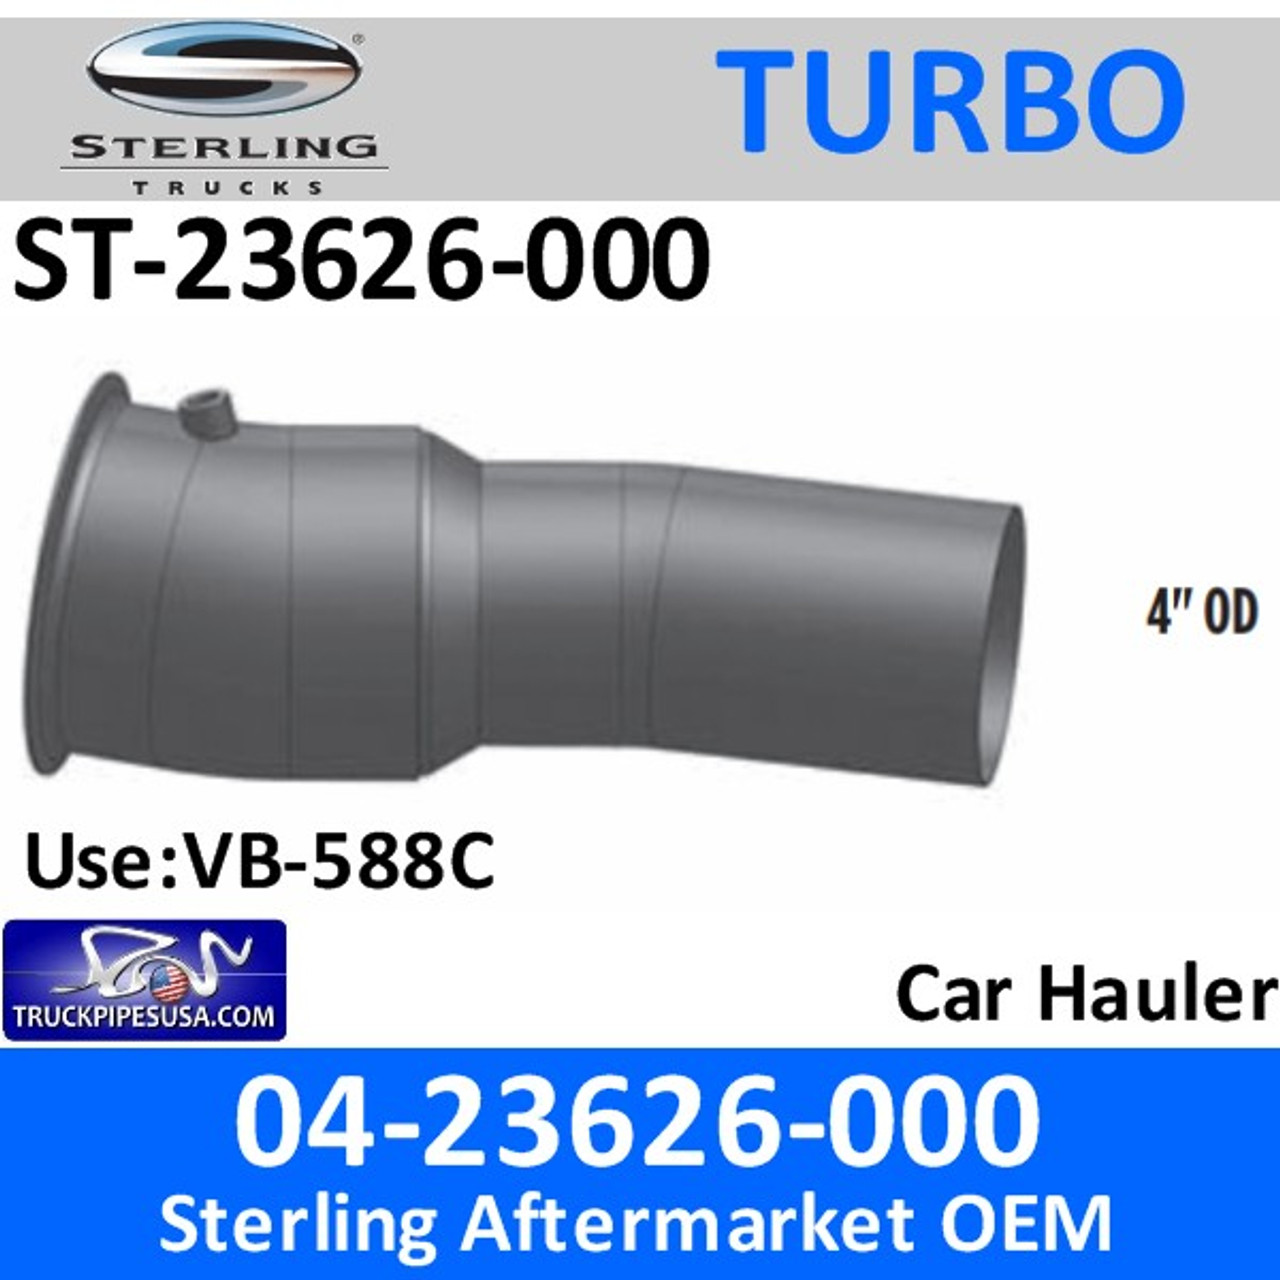 04-23626-000 Sterling Car Hauler Turbo Pyro Pipe ST-23626-000